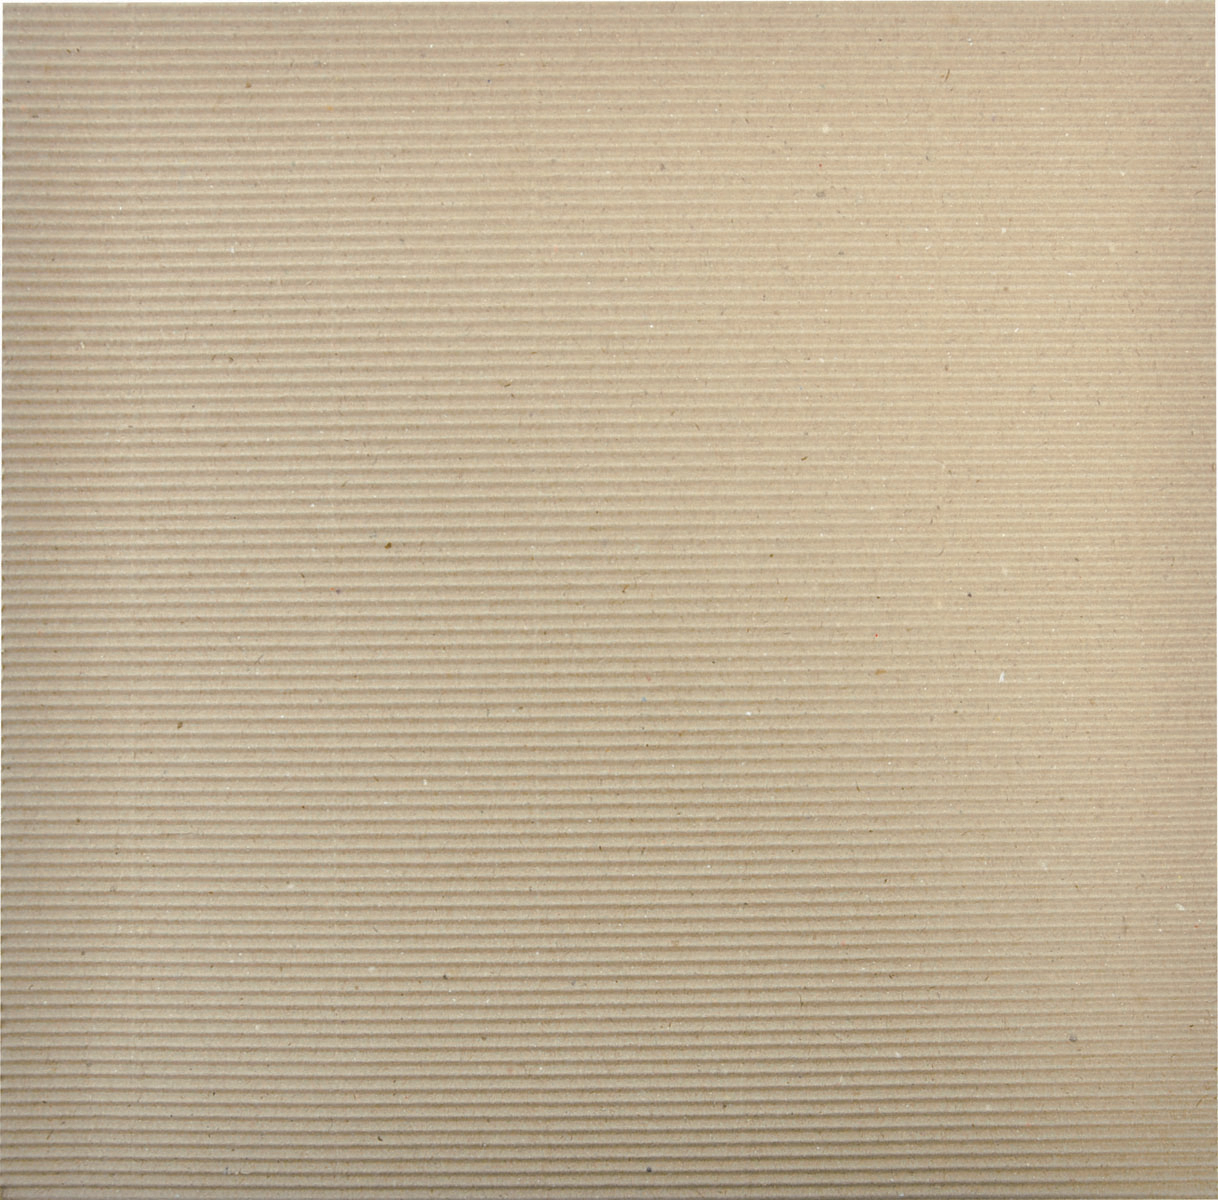 "Corrugated Cardboard Sheets, 12"" x 12"", 3-Pack"